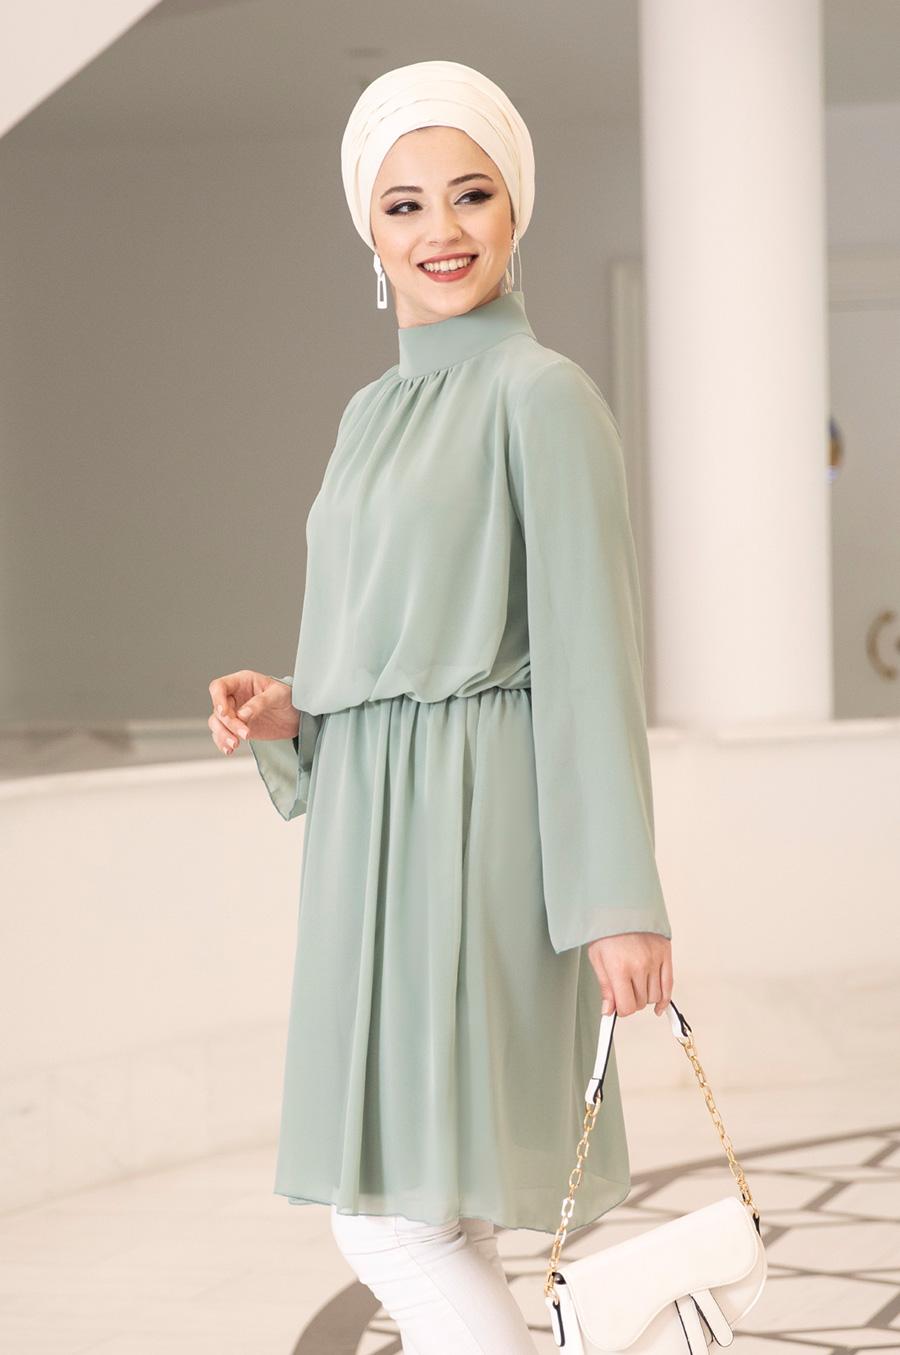 Hijab Tunic Polo Neck Chiffon Fabric Loose Cut Large Size Islamic Clothing High Quality Made in Turkey